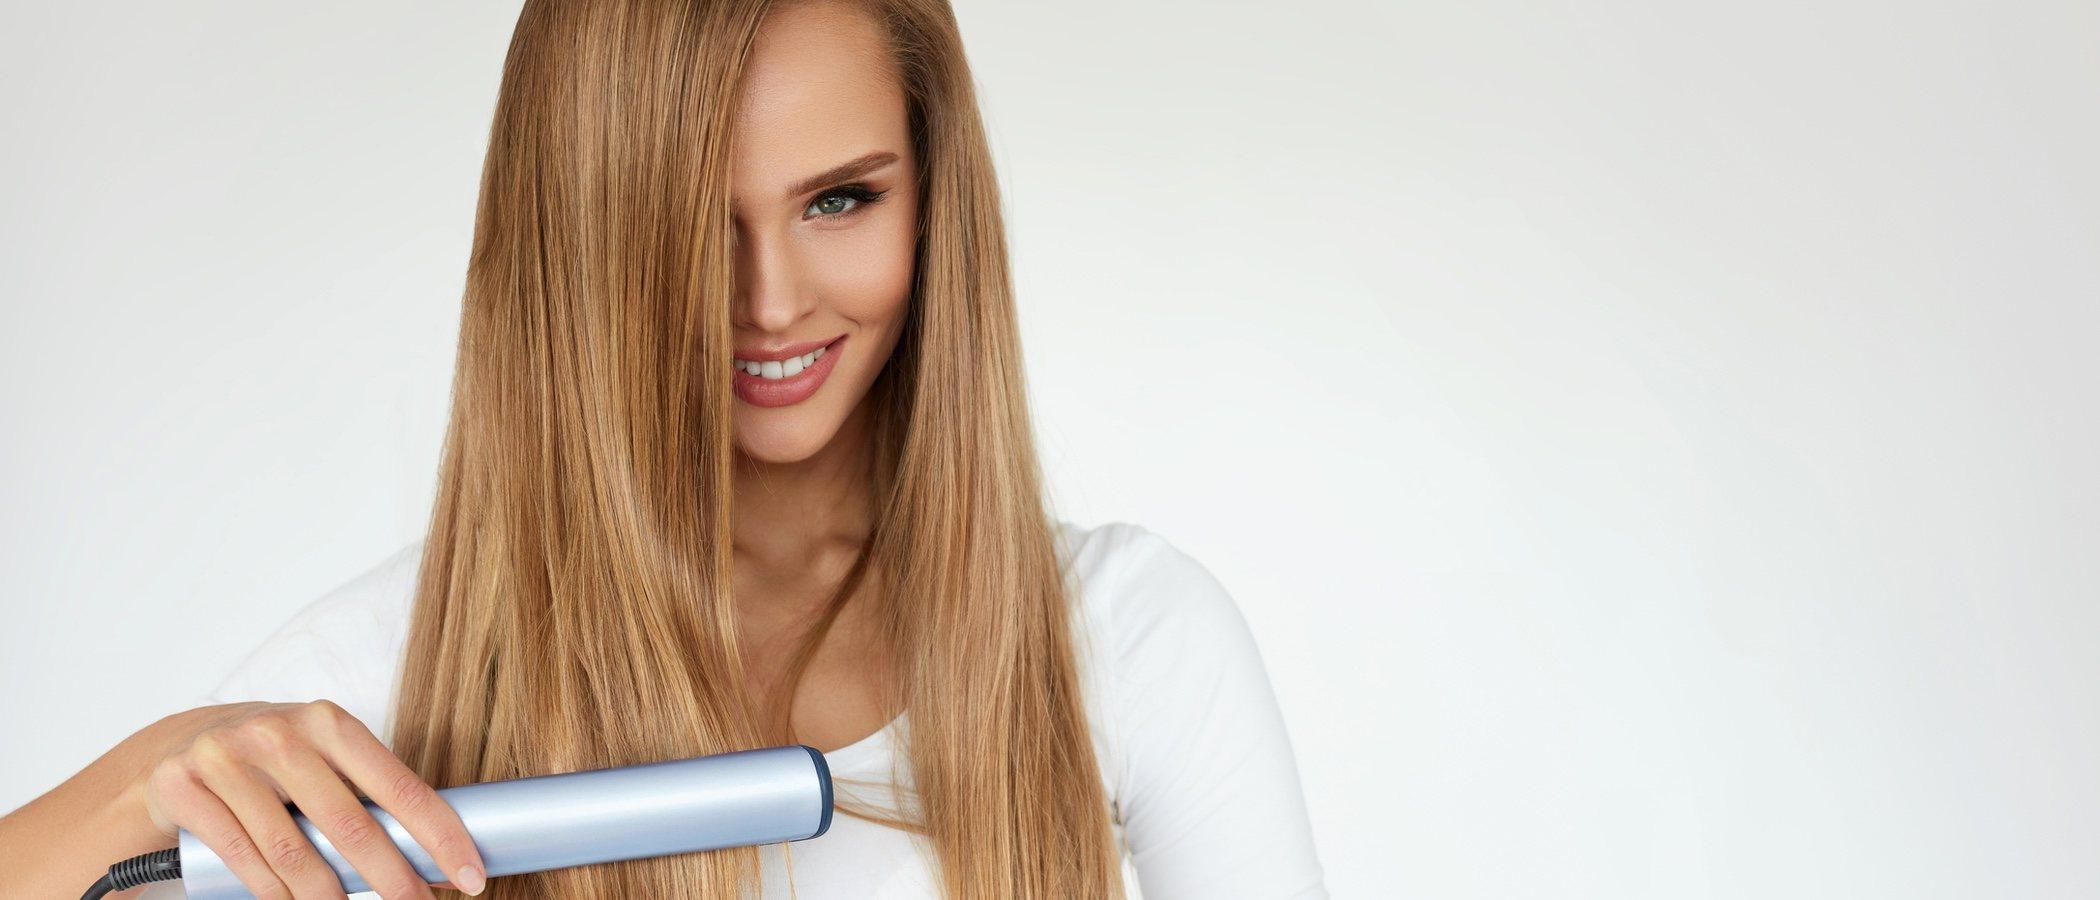 Planchas de pelo: cuál elegir